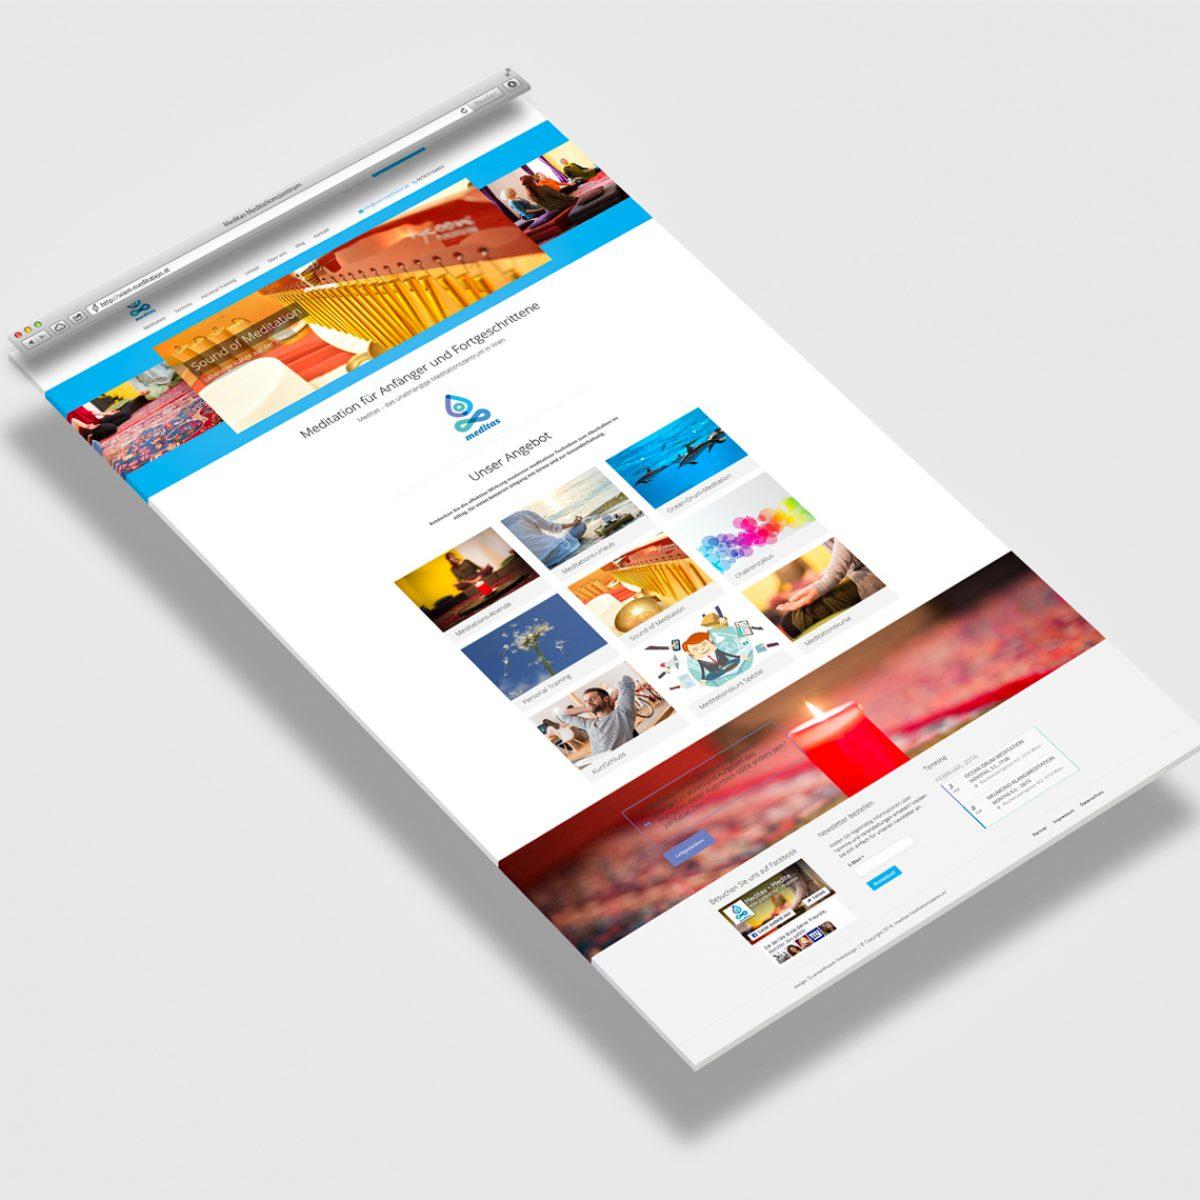 Webdesign Beispielprojekt Meditas Meditationszentrum